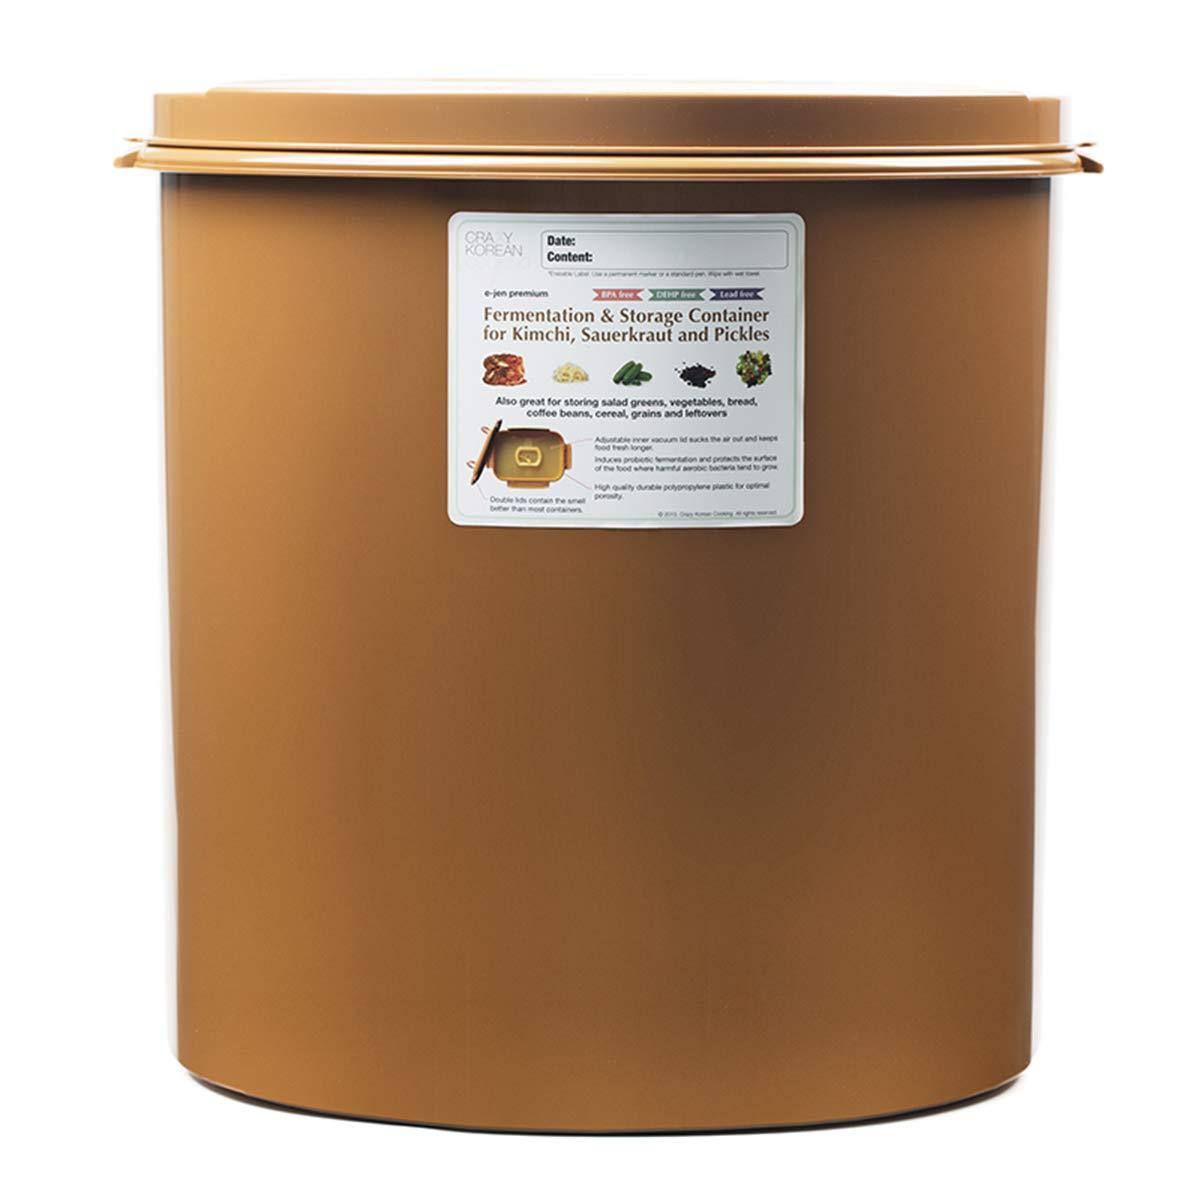 Premium Kimchi, Sauerkraut Fermentation and Storage Container with Inner Vacuum Lid - 11.8 Gallon (45L) Round Shape